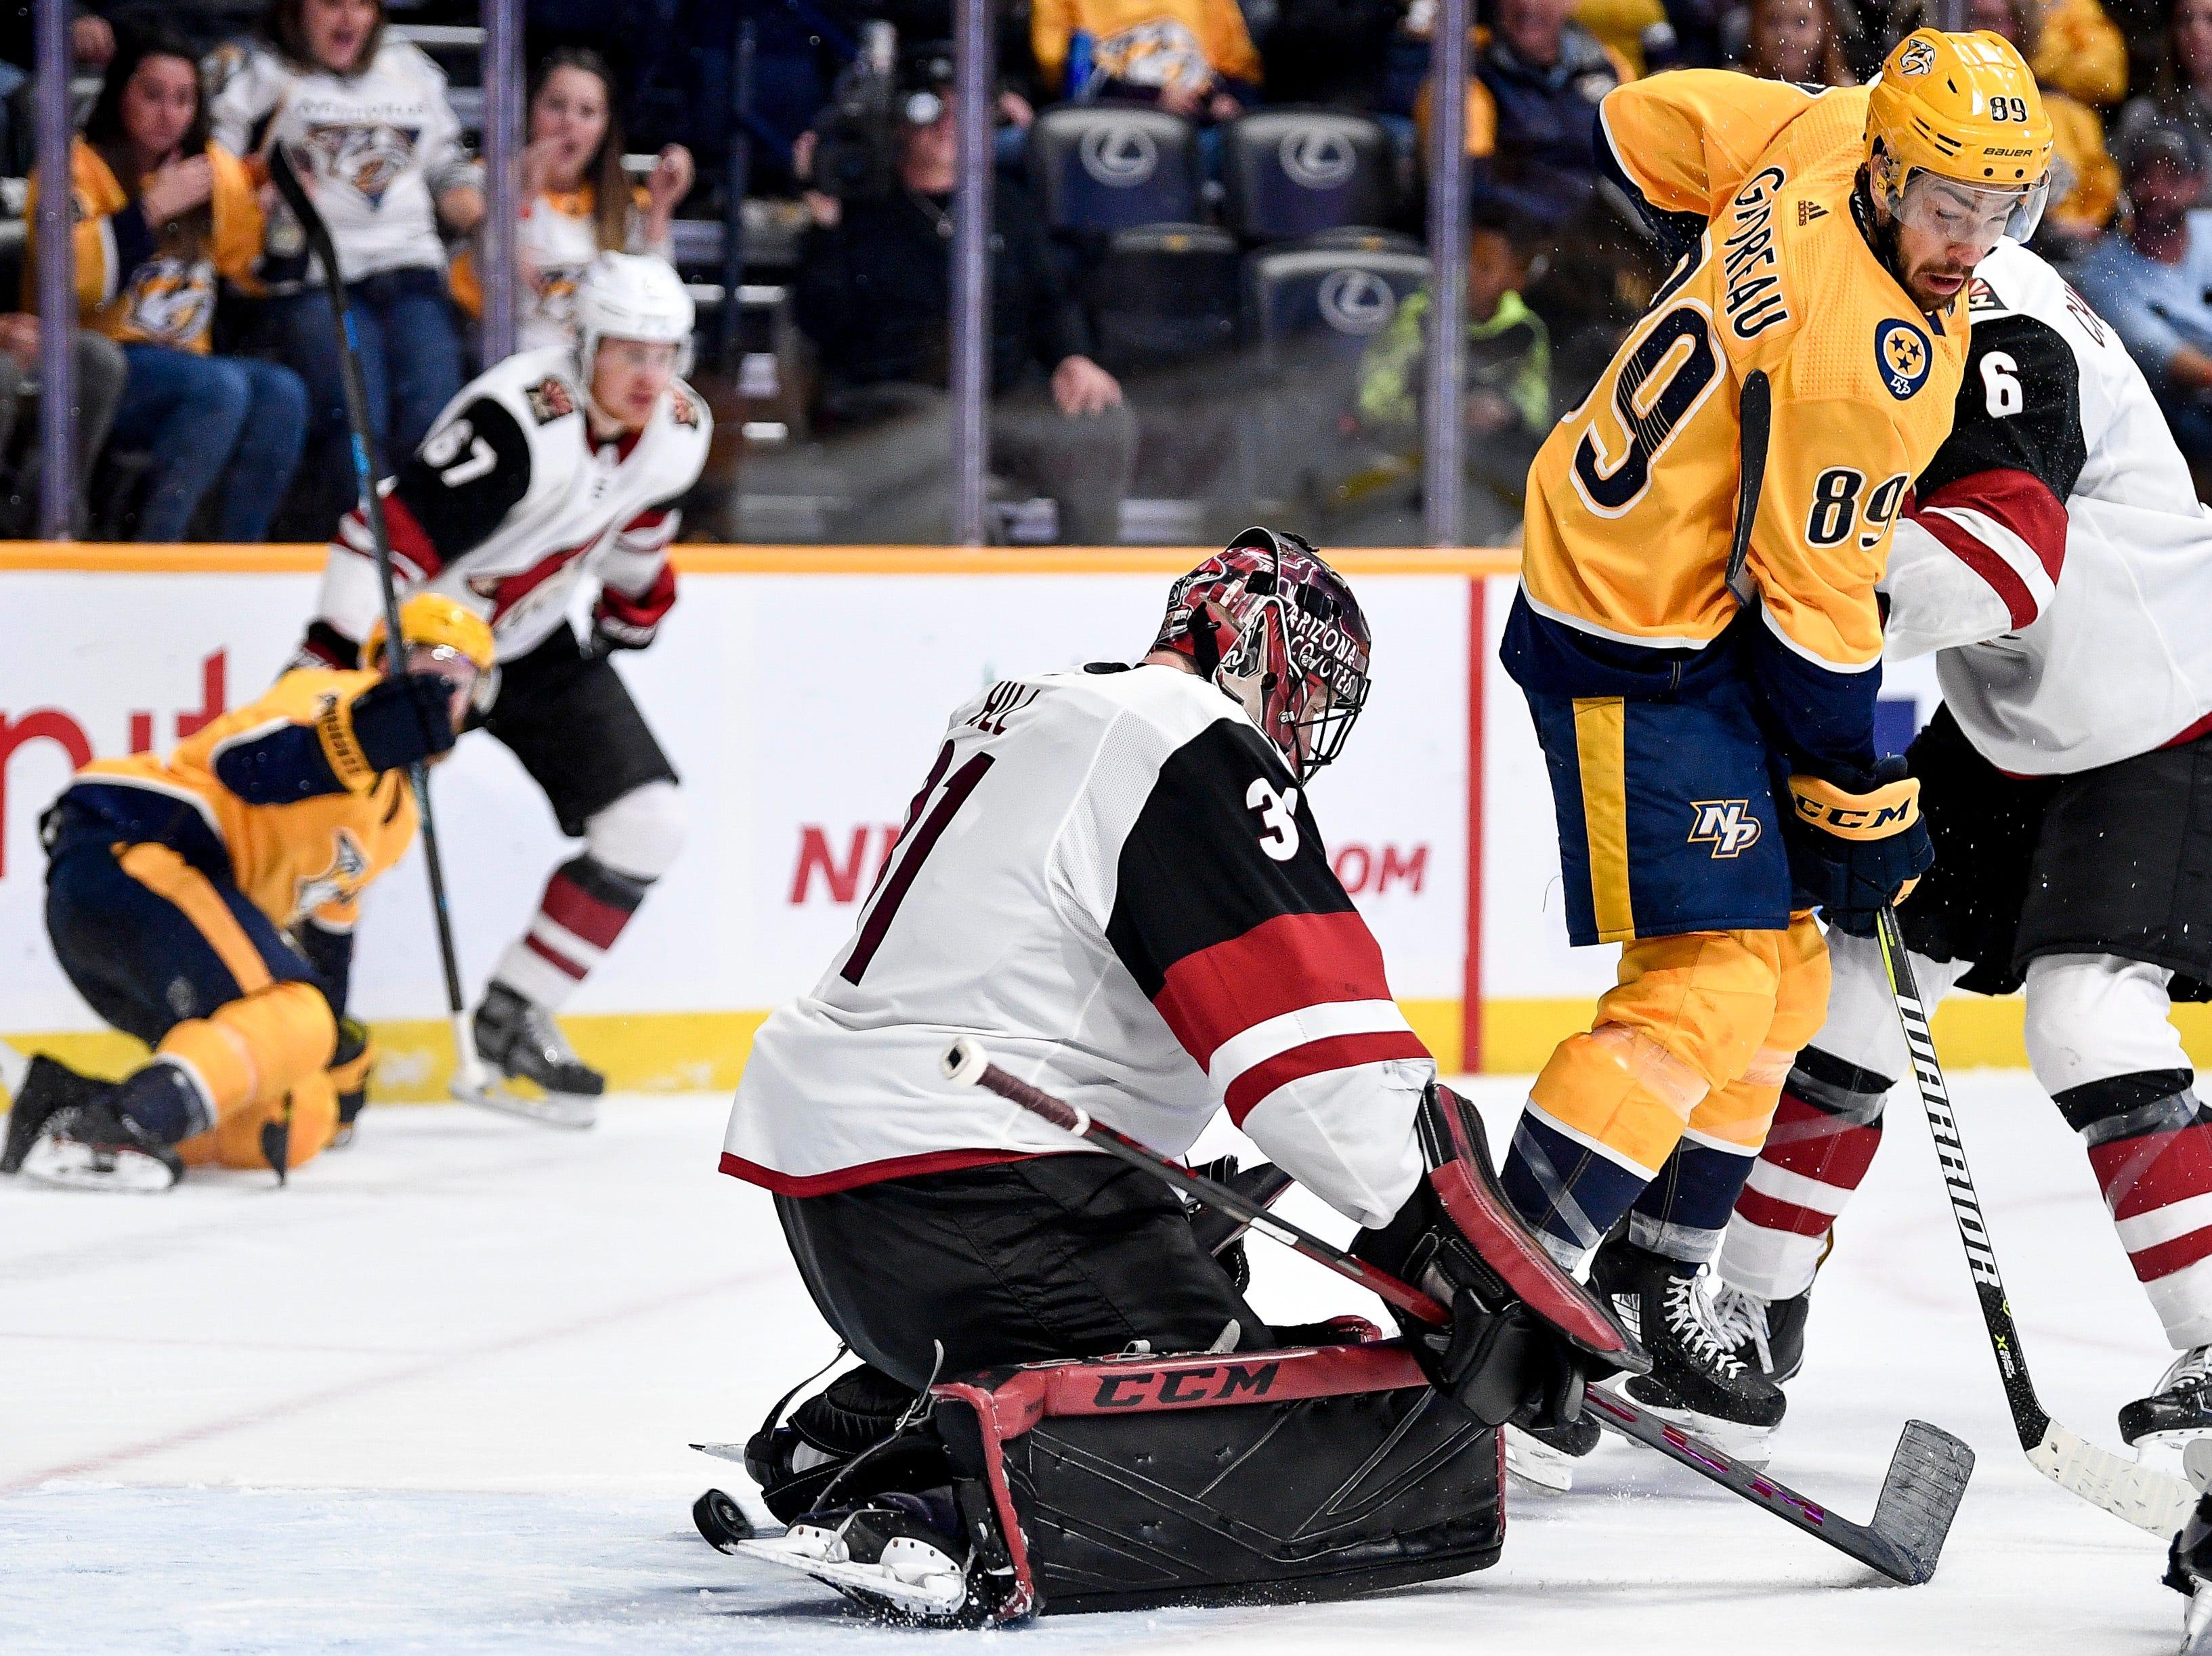 A Nashville Predators shot slips past Arizona Coyotes goaltender Adin Hill (31) before landing outside of the net during the third period at Bridgestone Arena in Nashville, Tenn., Thursday, Nov. 29, 2018.